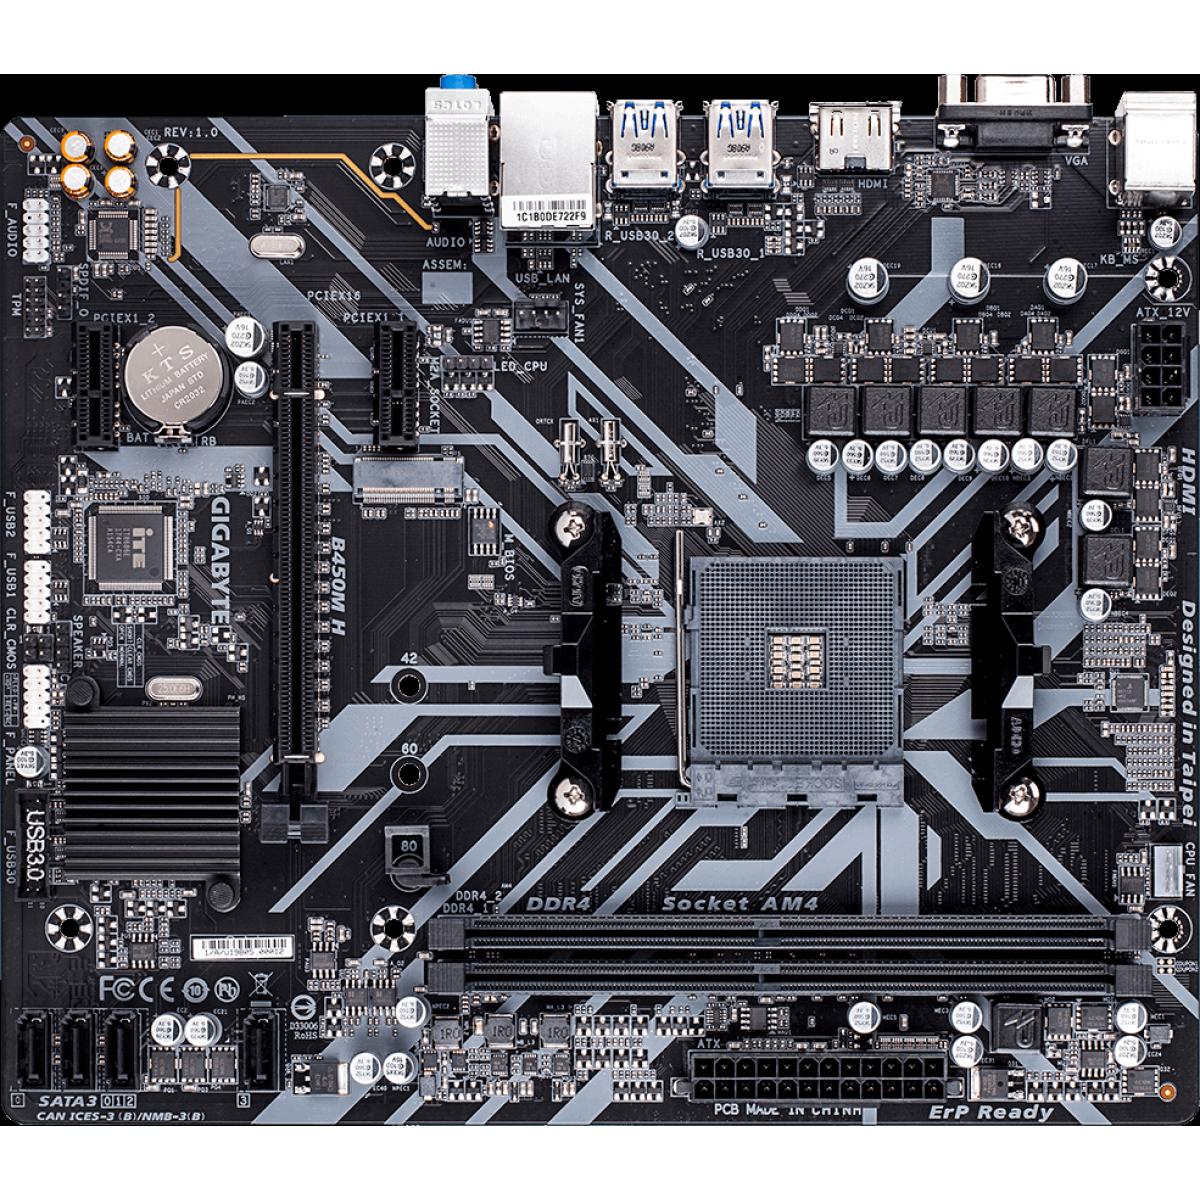 Placa Mãe Gigabyte B450M H, Chipset B450, AMD AM4, mATX, DDR4